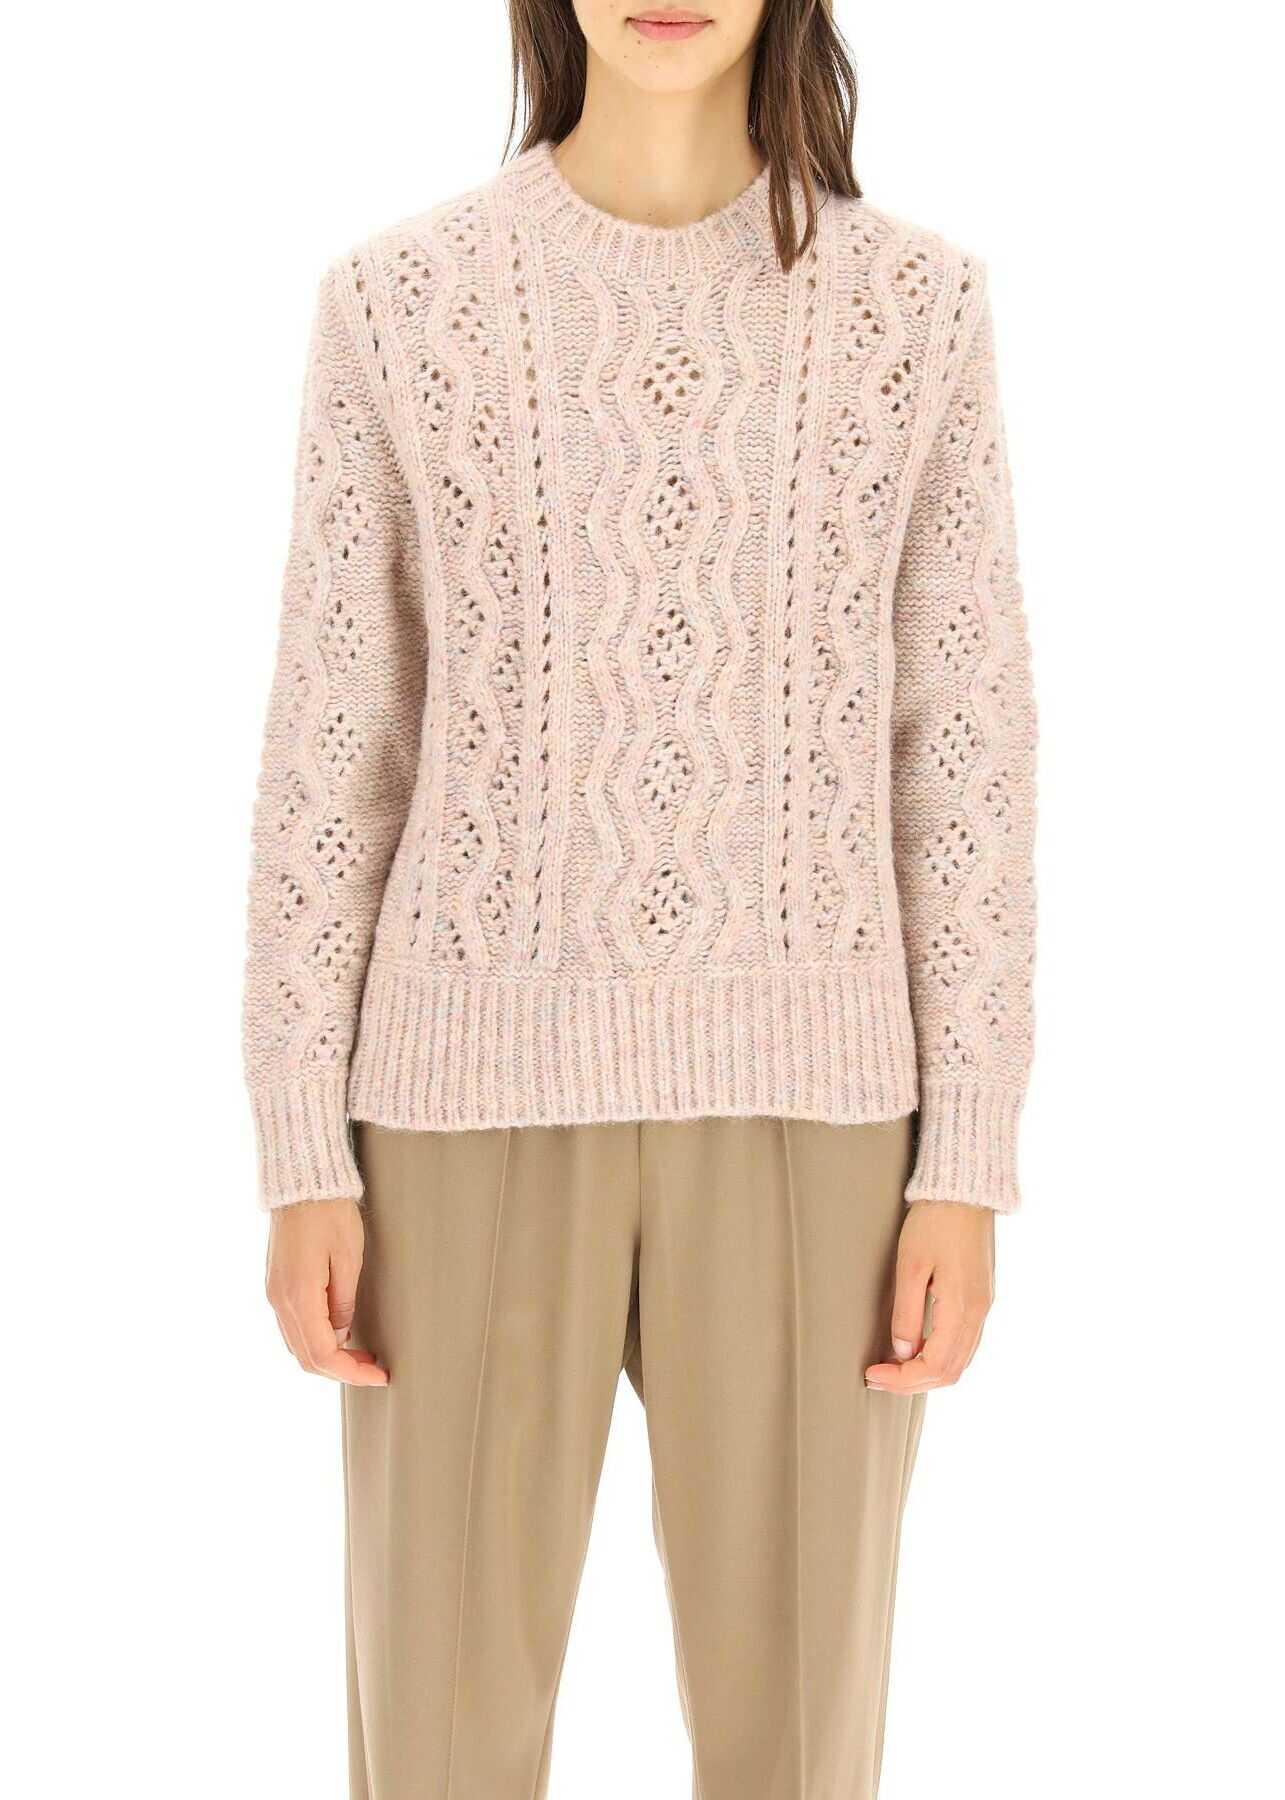 A.P.C. A.p.c. Alissandre Sweater WPAAV F23082 MULTICOLOR image0